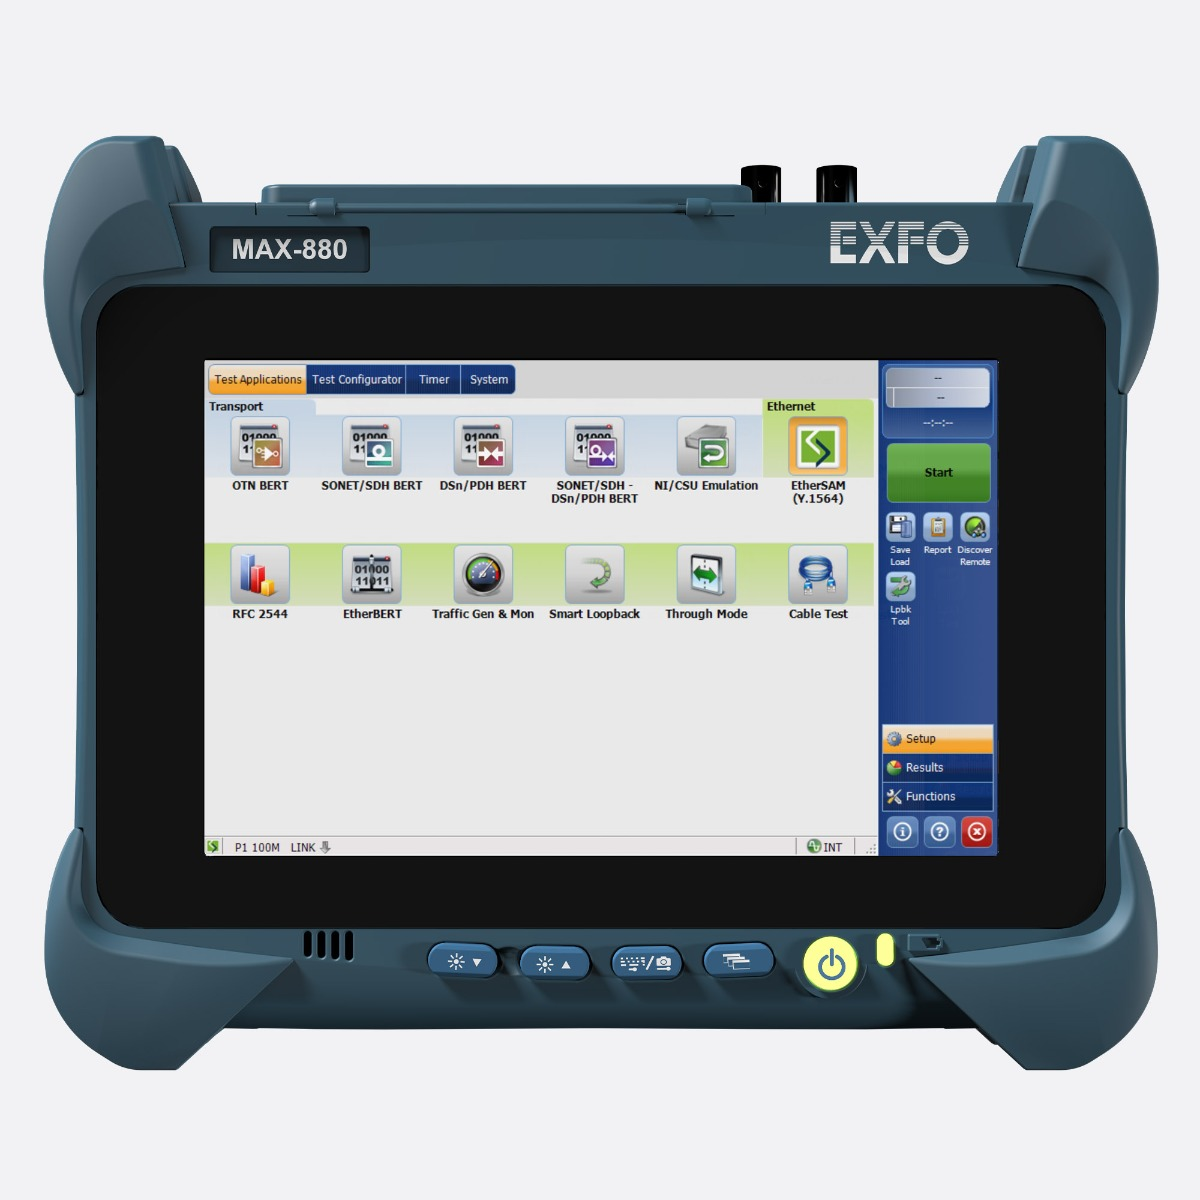 EXFO_MAX-800-series_front_Ccontrols